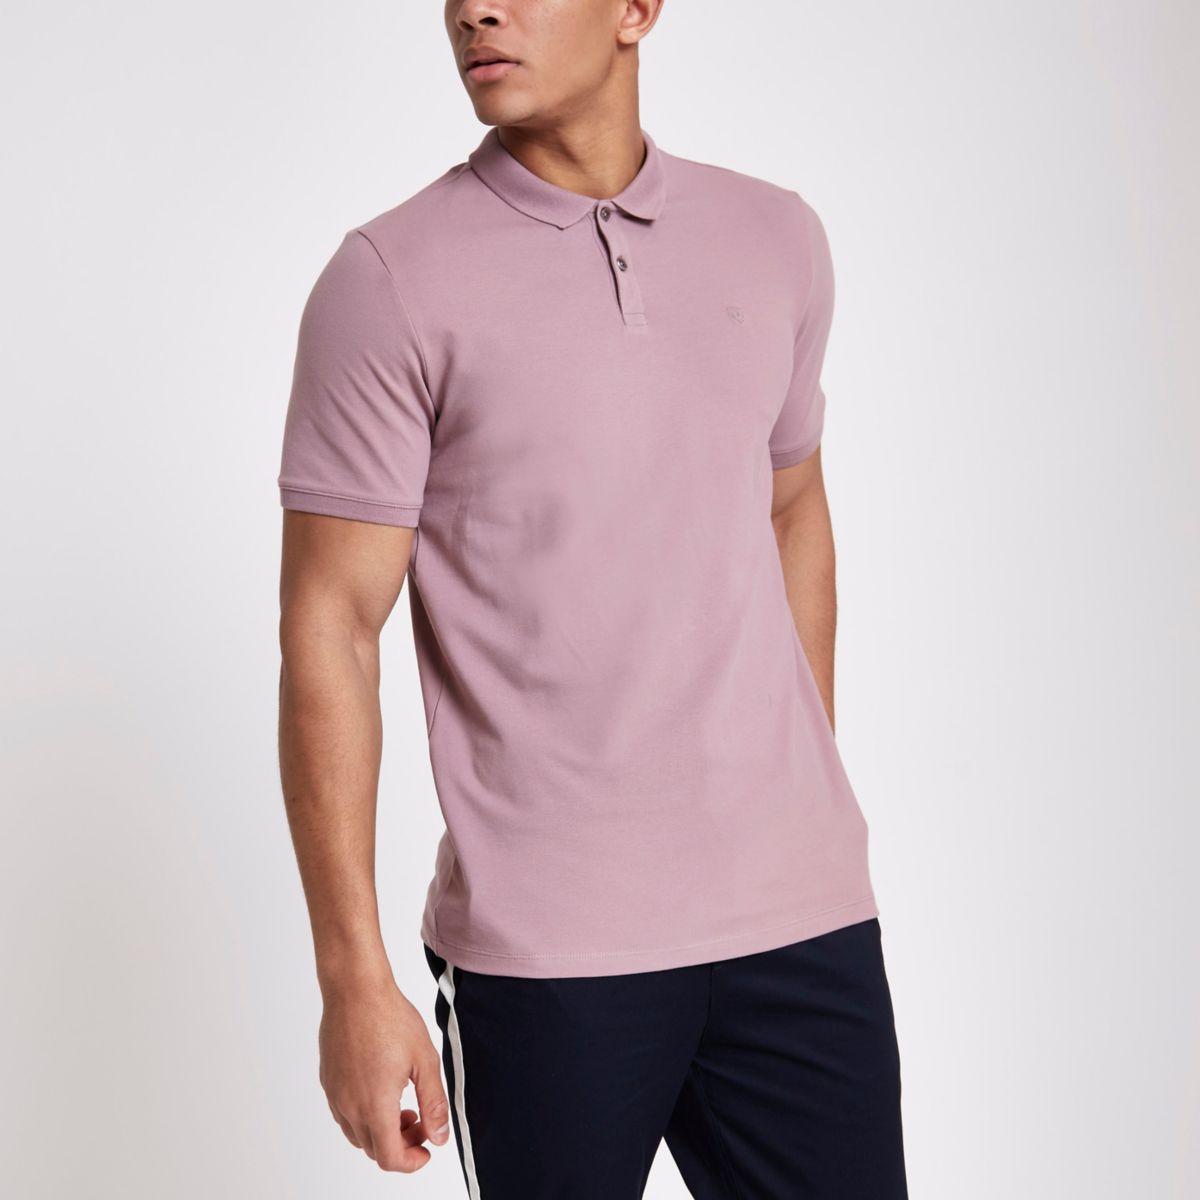 Jack & Jones Premium pink polo shirt